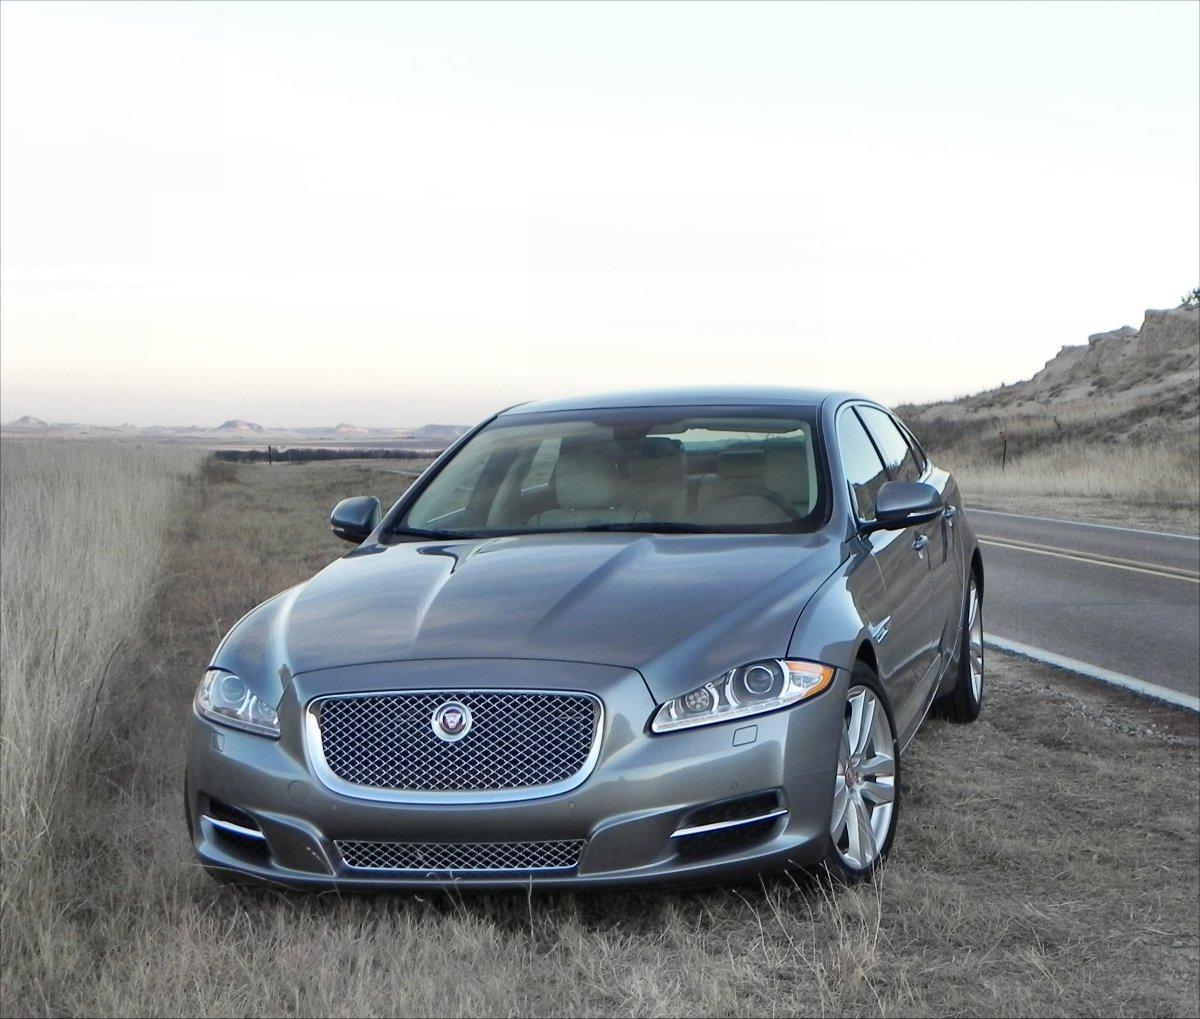 Jaguar Xf Awd For Sale: 2015 Jaguar XJL Portfolio AWD : Review